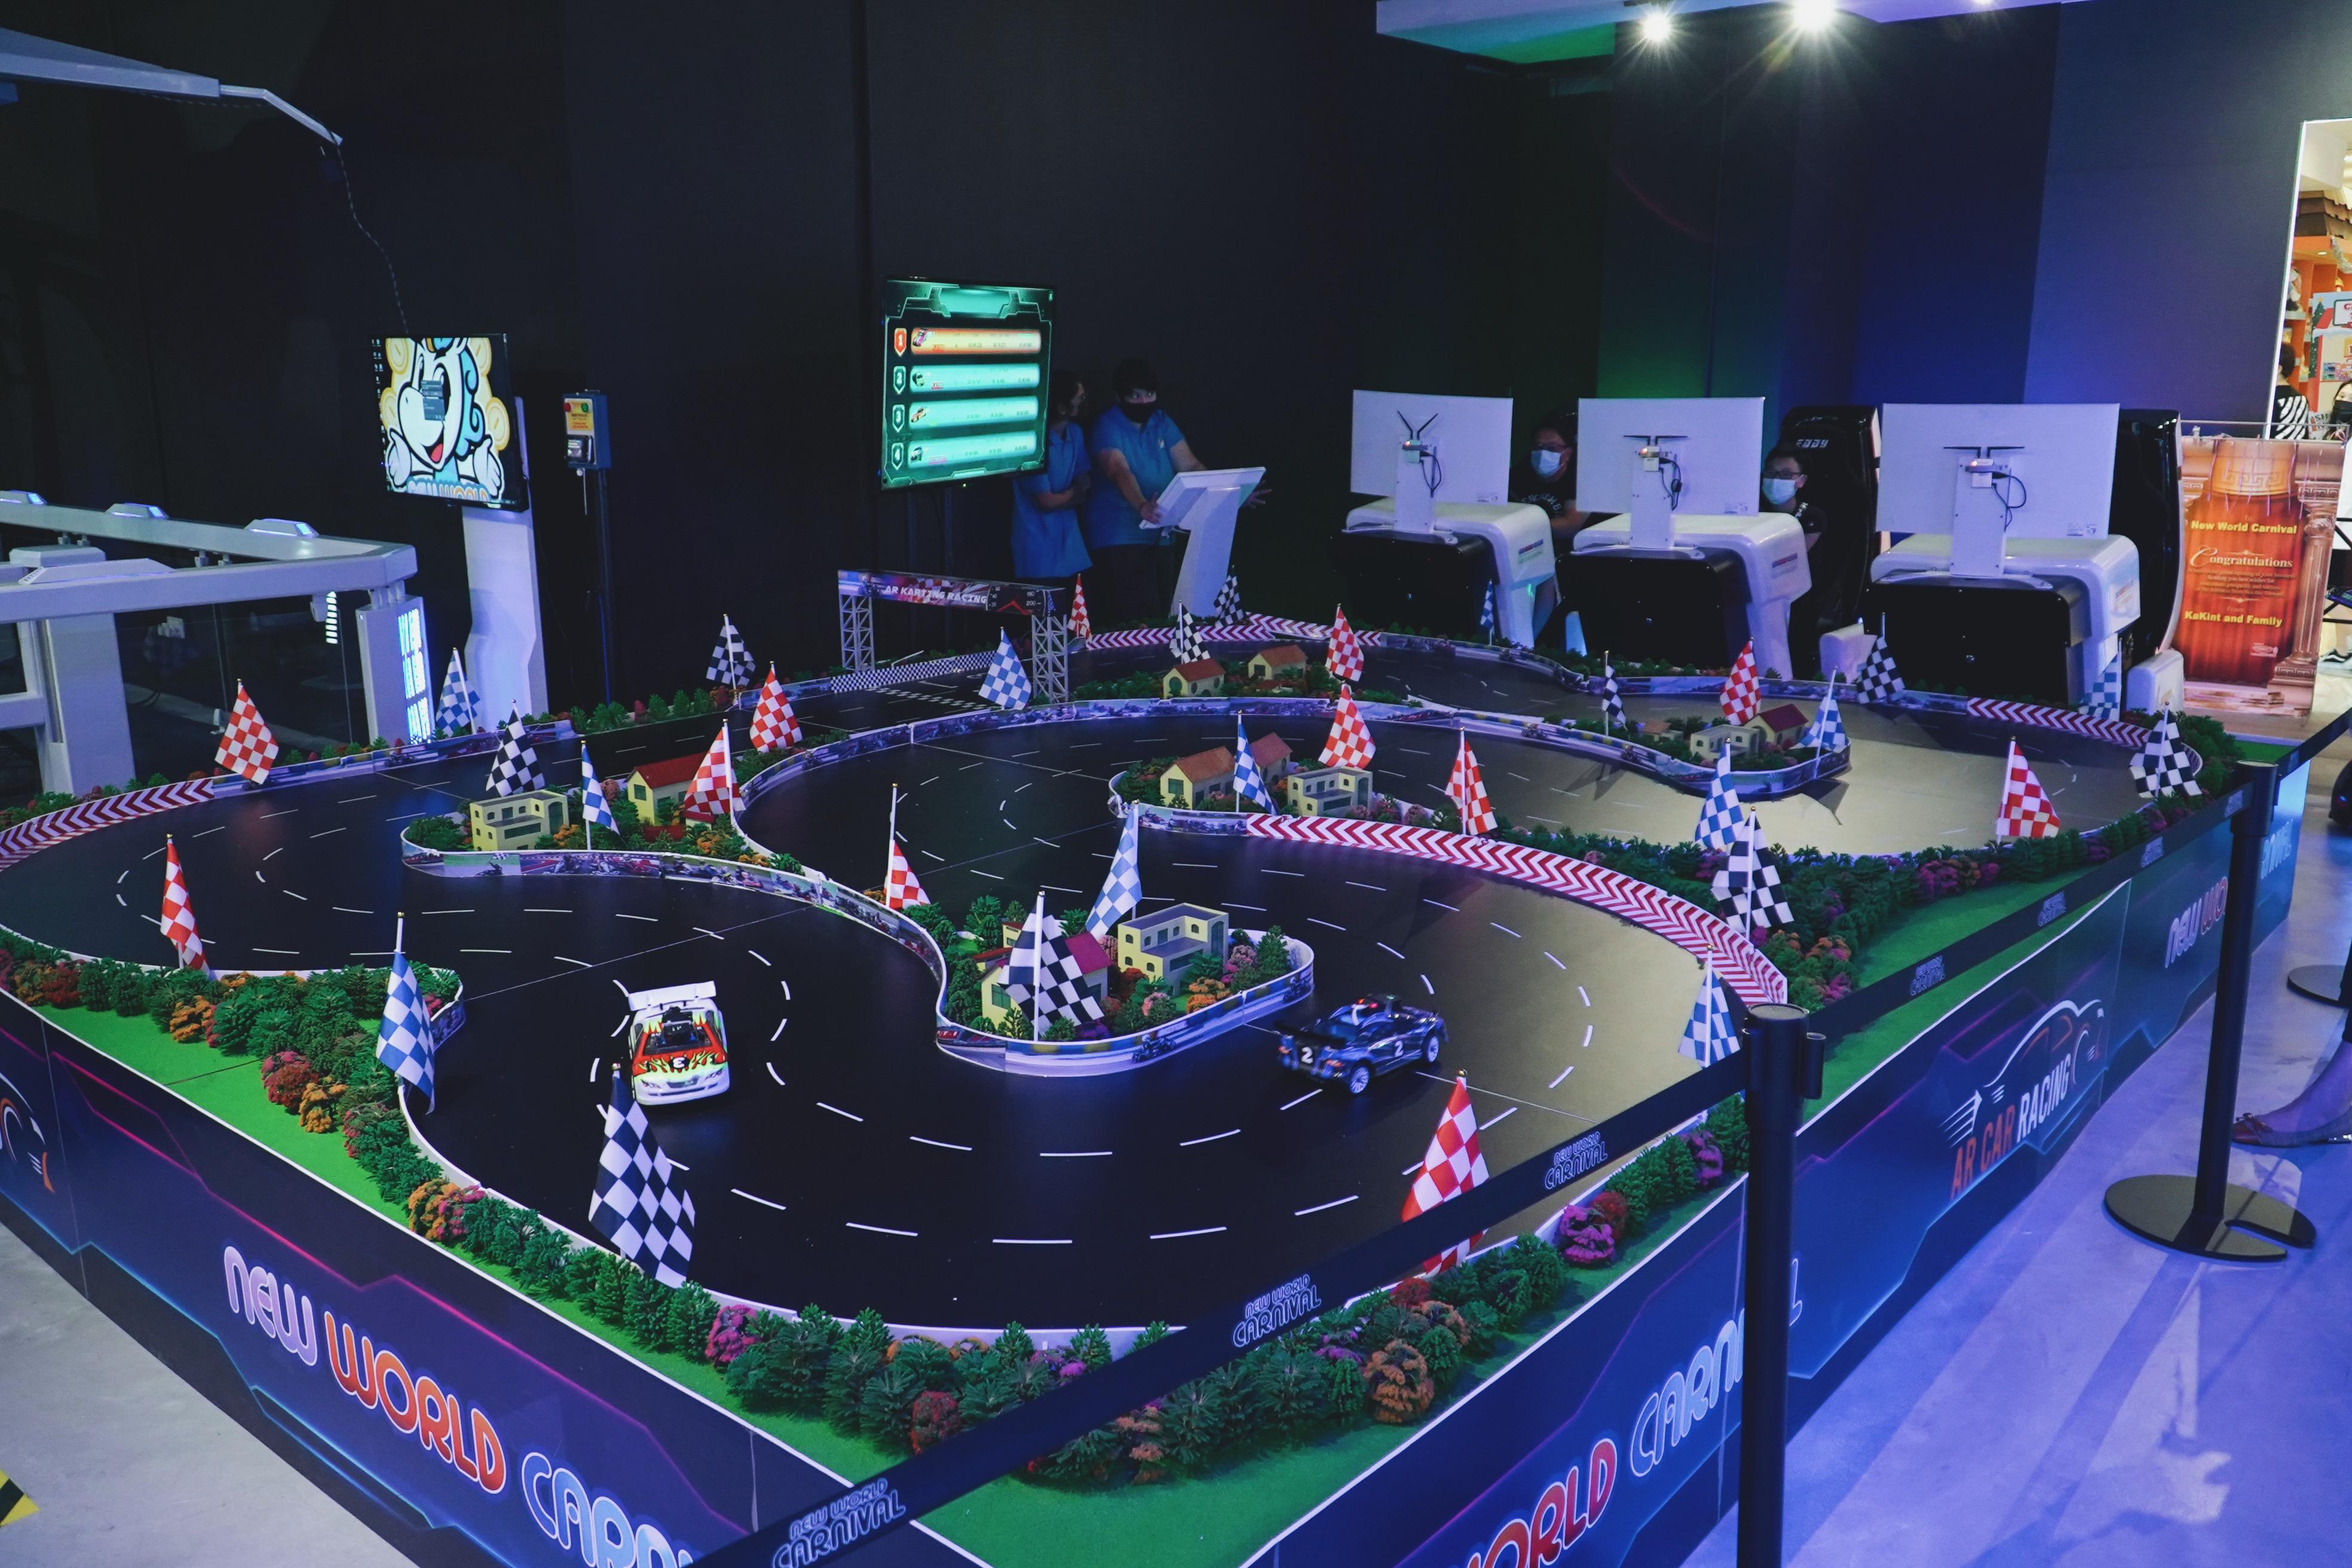 60 Virtual Reality Credits + 120 Arcade Tokens at New World Carnival - Get Deals, Cashback and Rewards with ShopBack GO